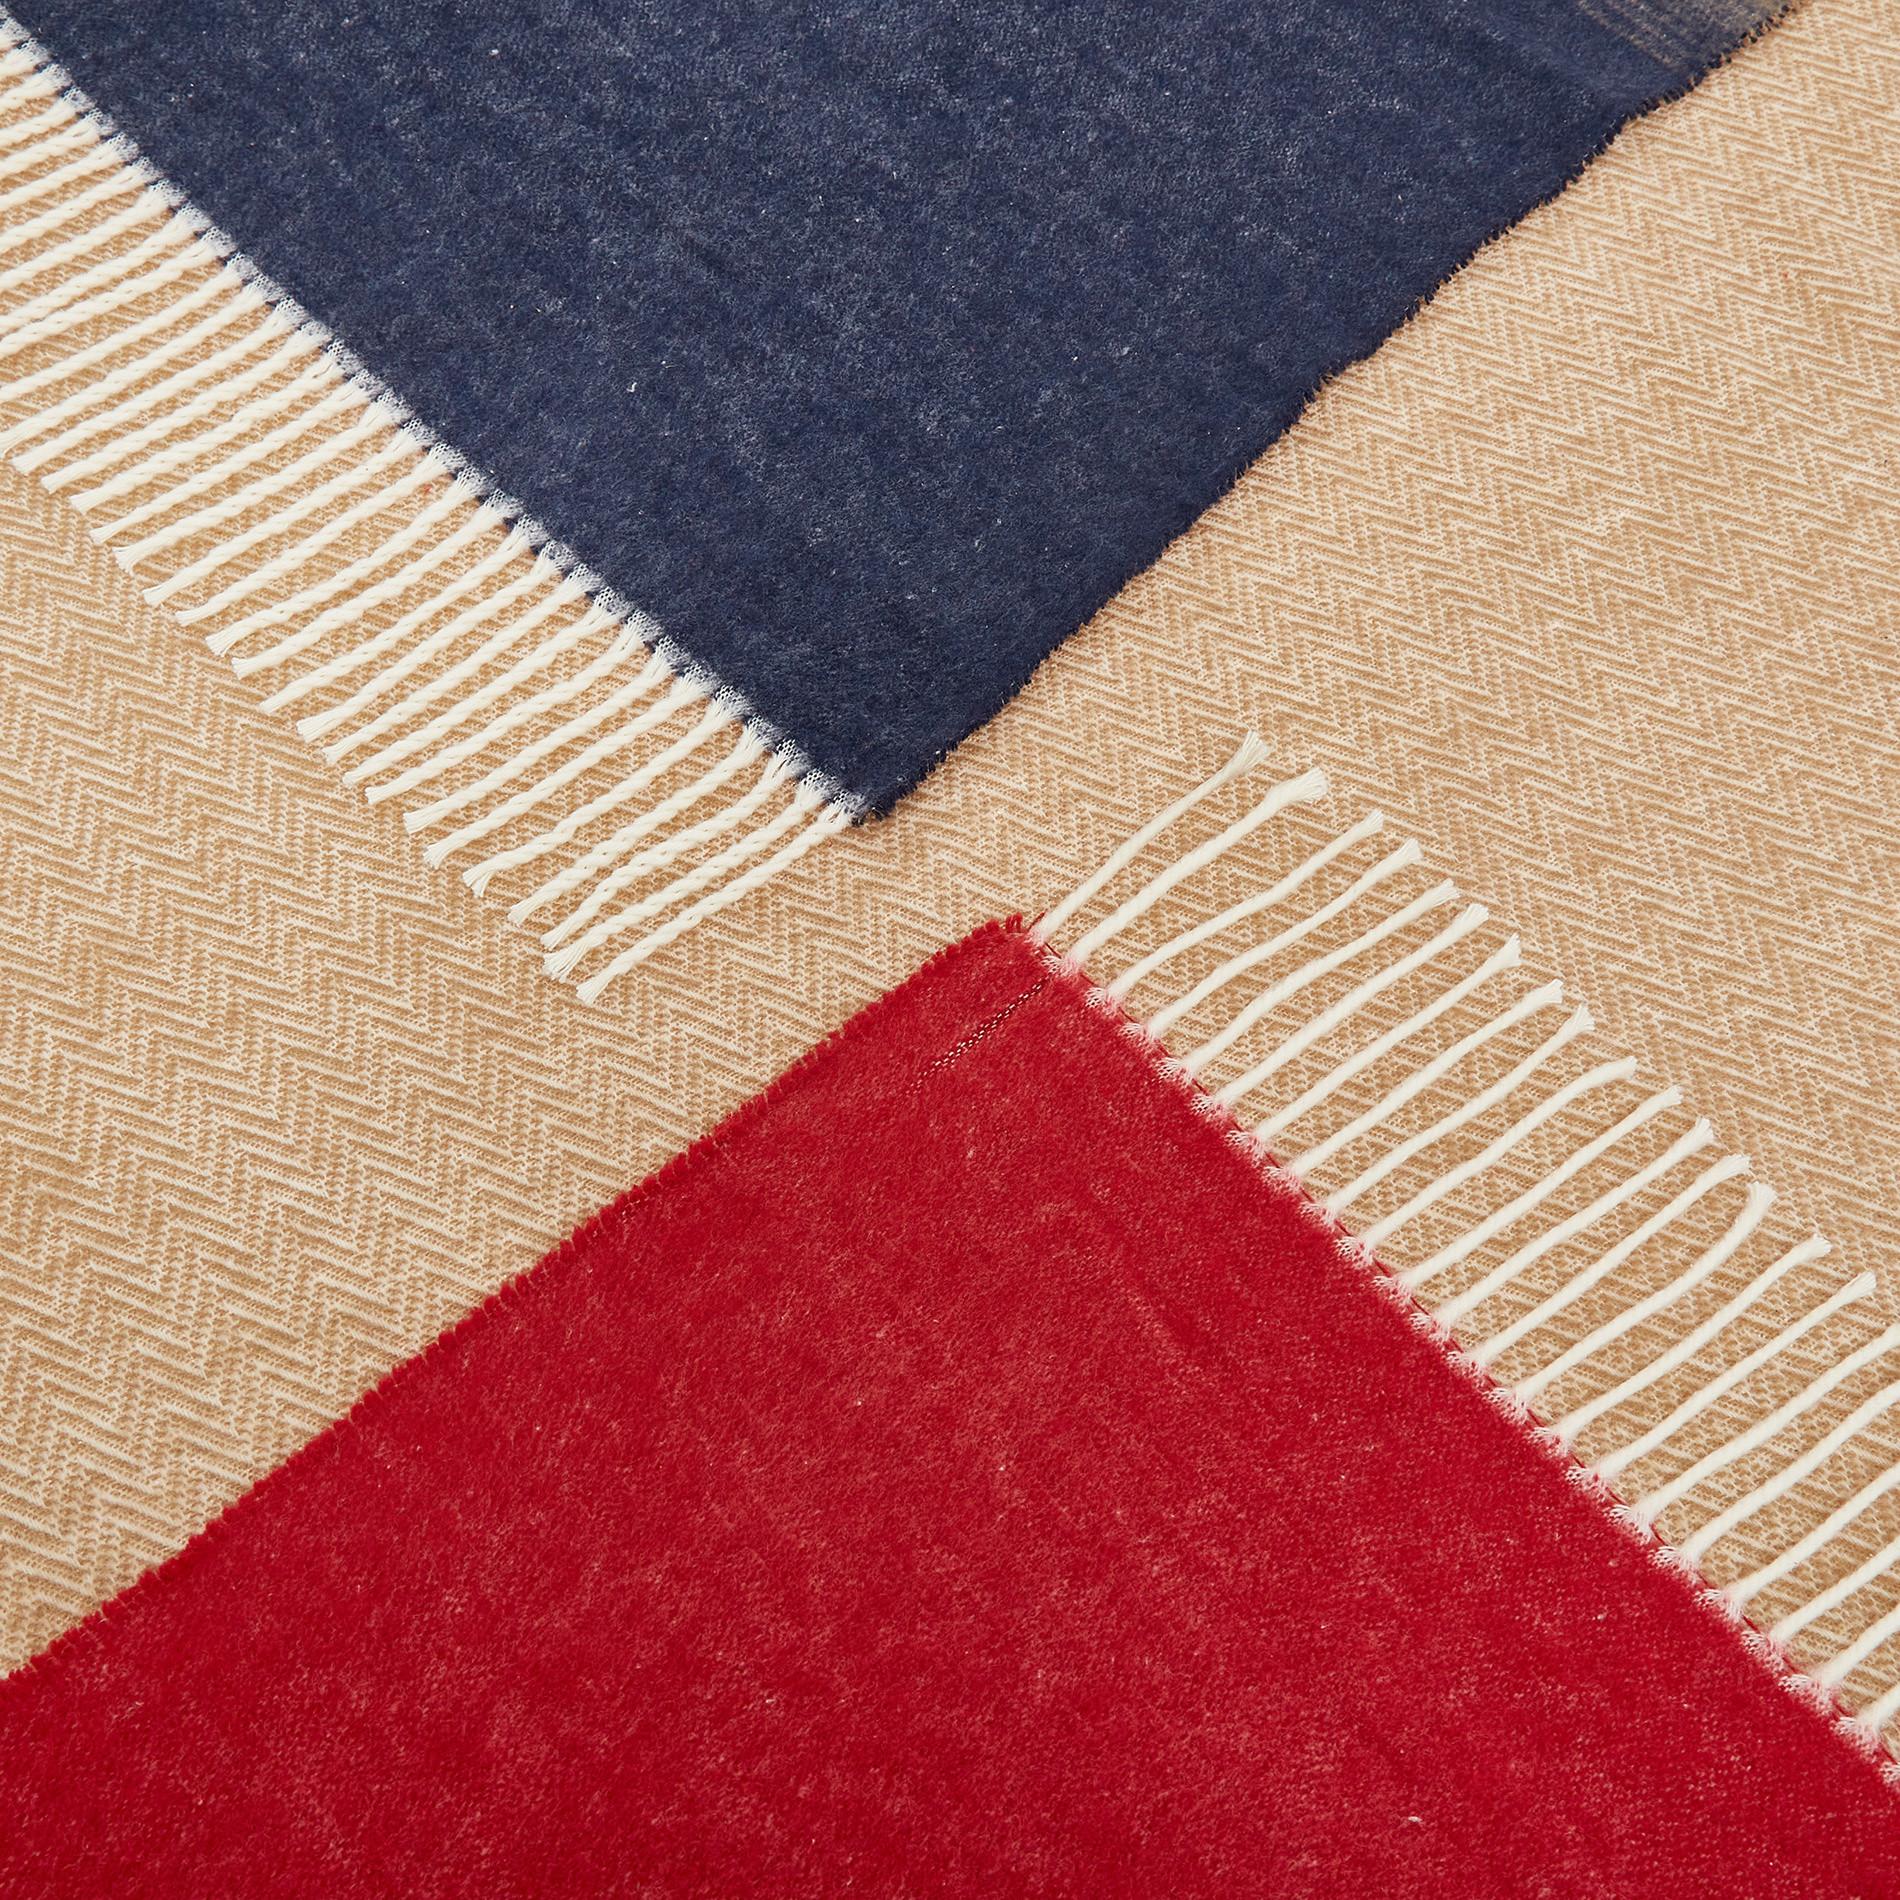 Plaid misto cotone con frange, Rosso, large image number 1